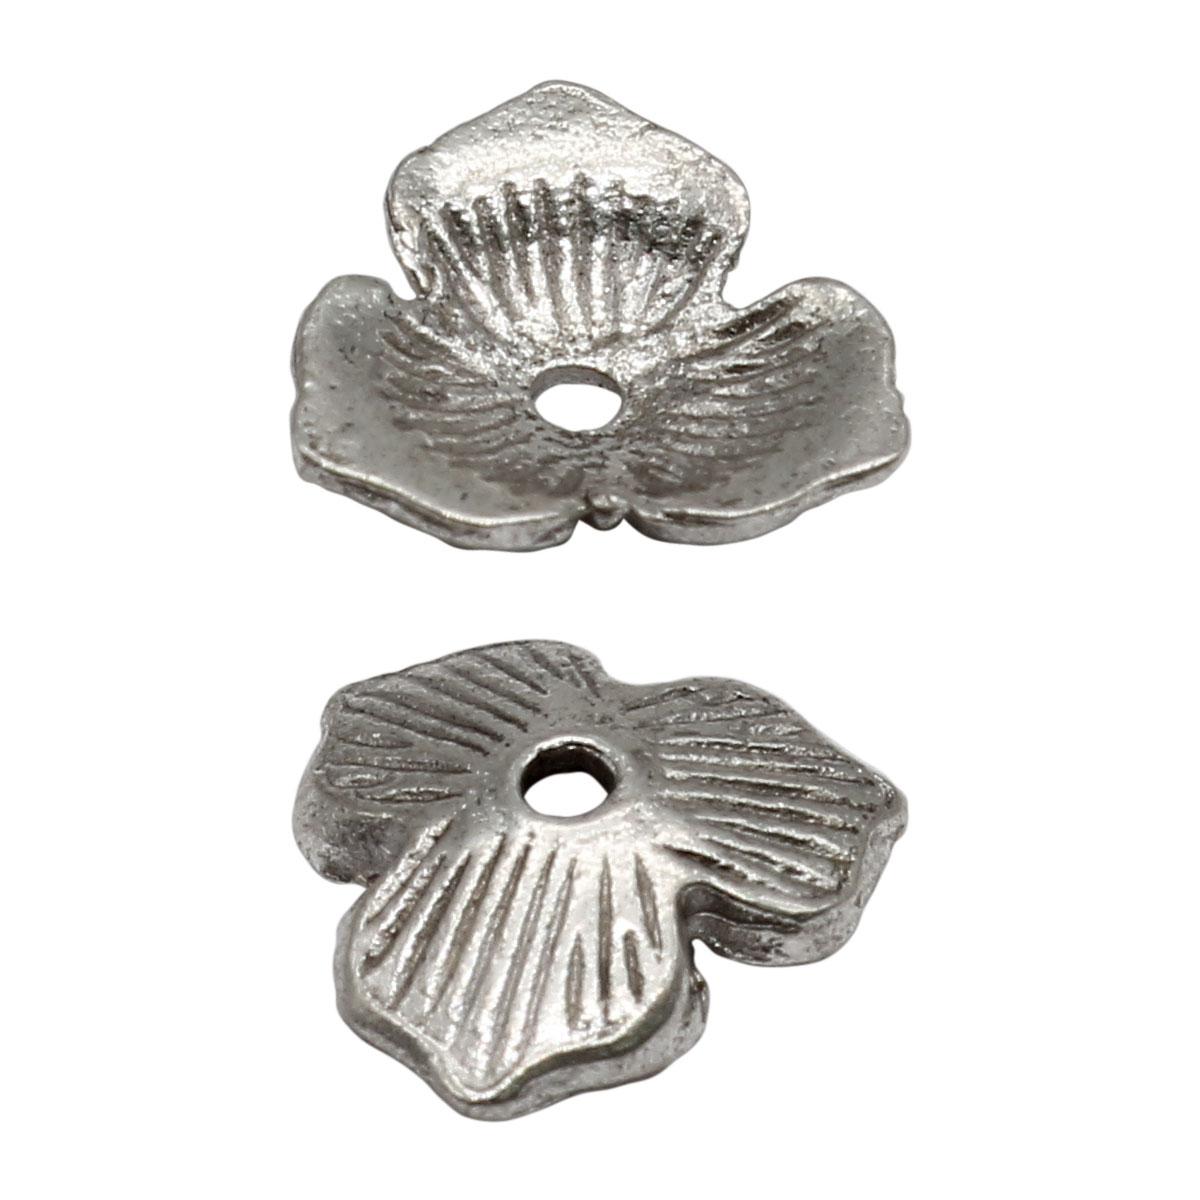 Шапочка для бусин 4AR285, 11мм, серебро, 10шт/упак, Астра